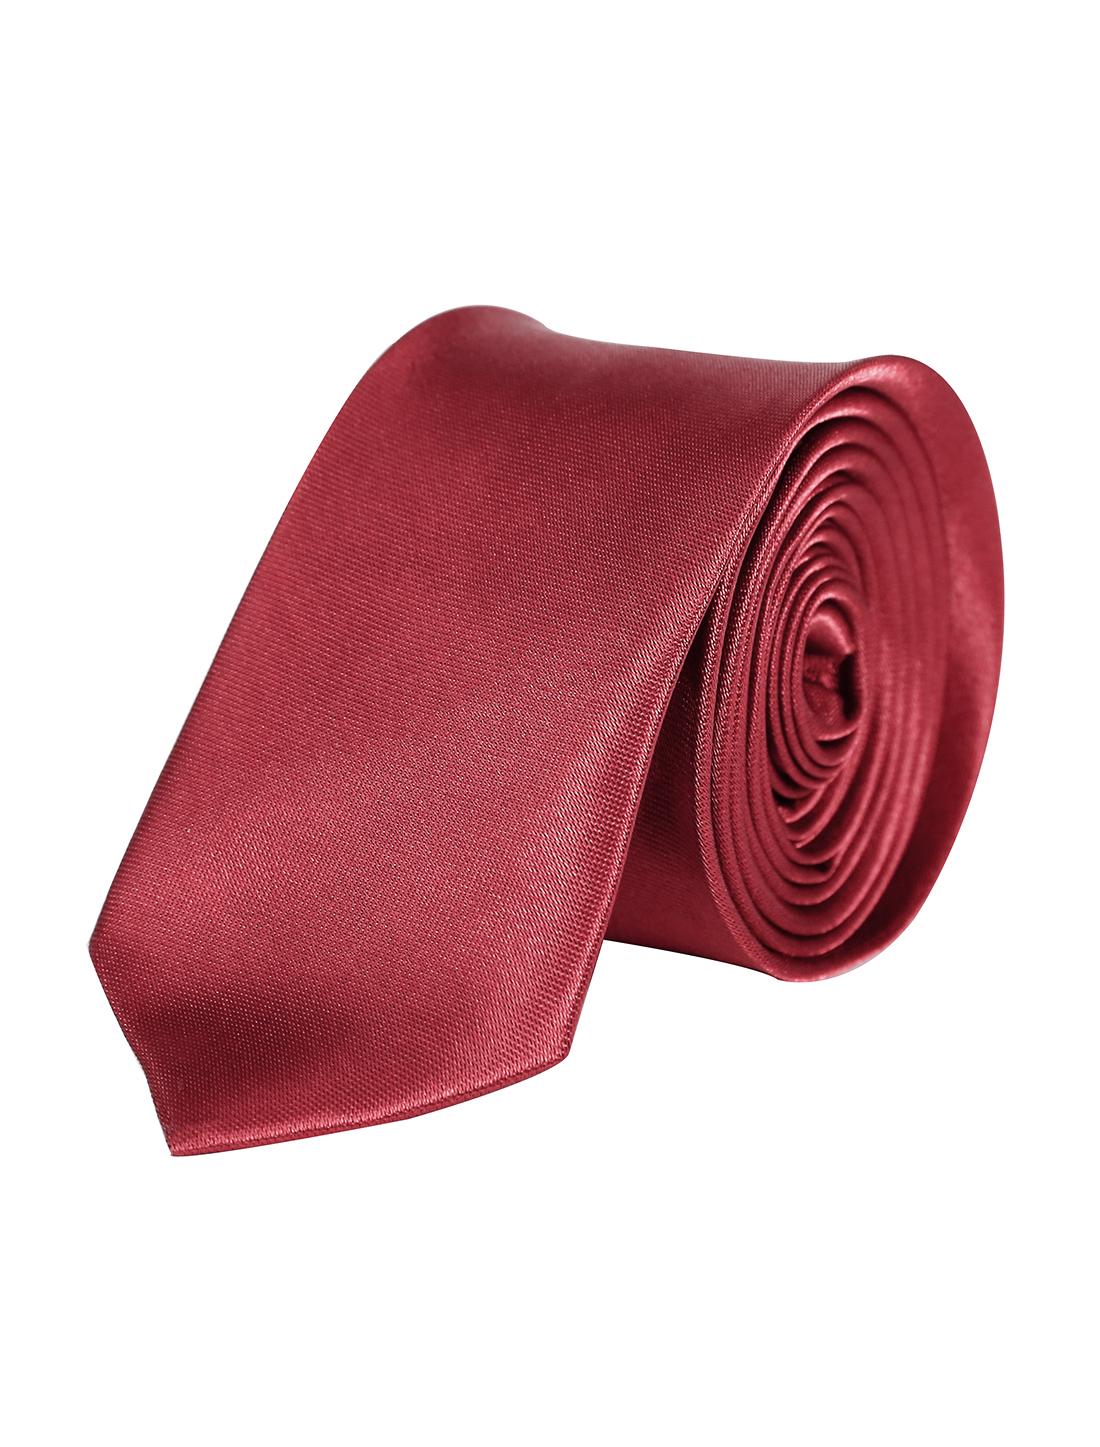 Men Bussiness Party Adjustable Neckwear Clothes Decor Thin Necktie Burgundy